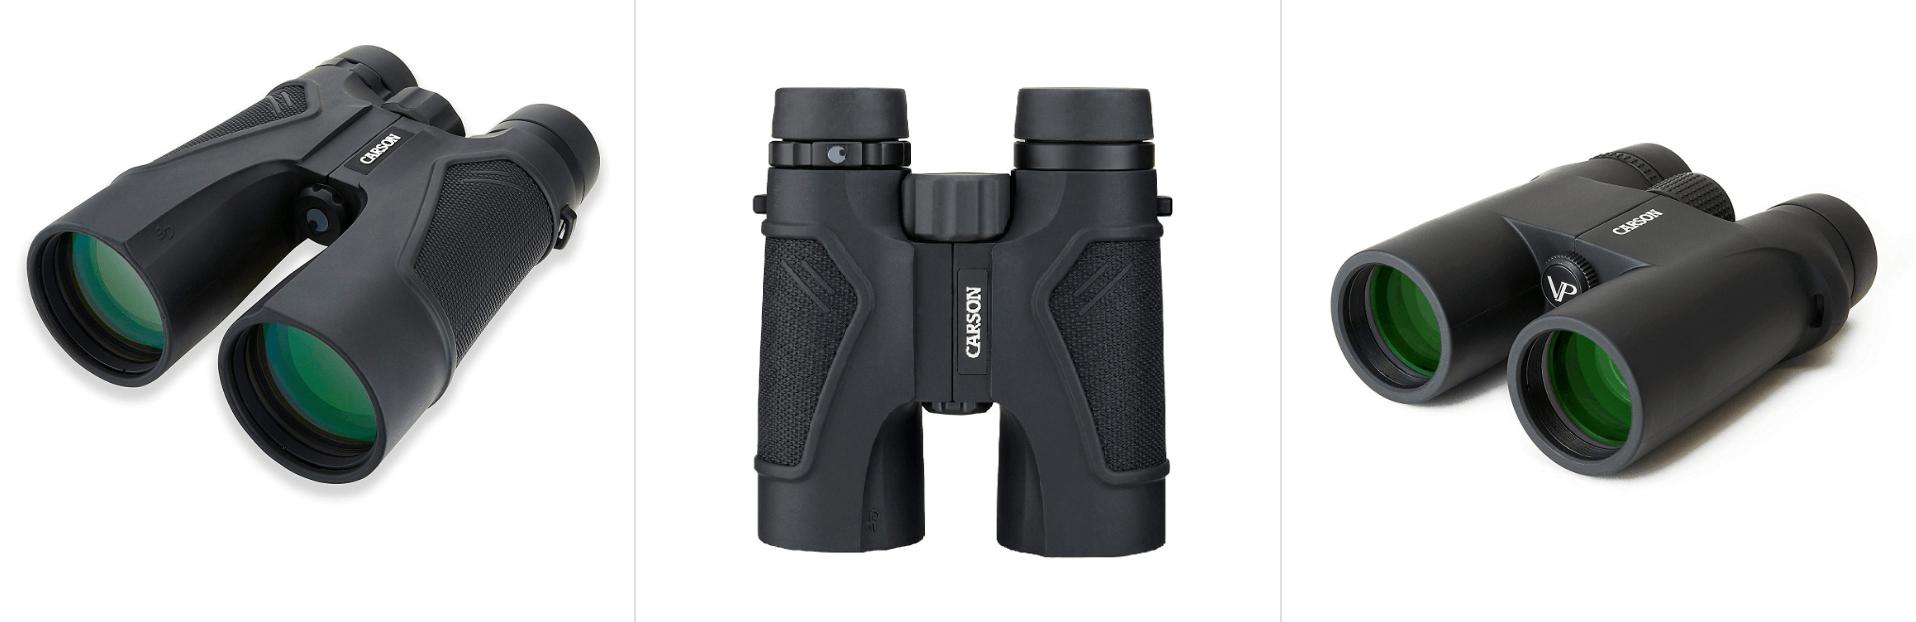 carson binoculars